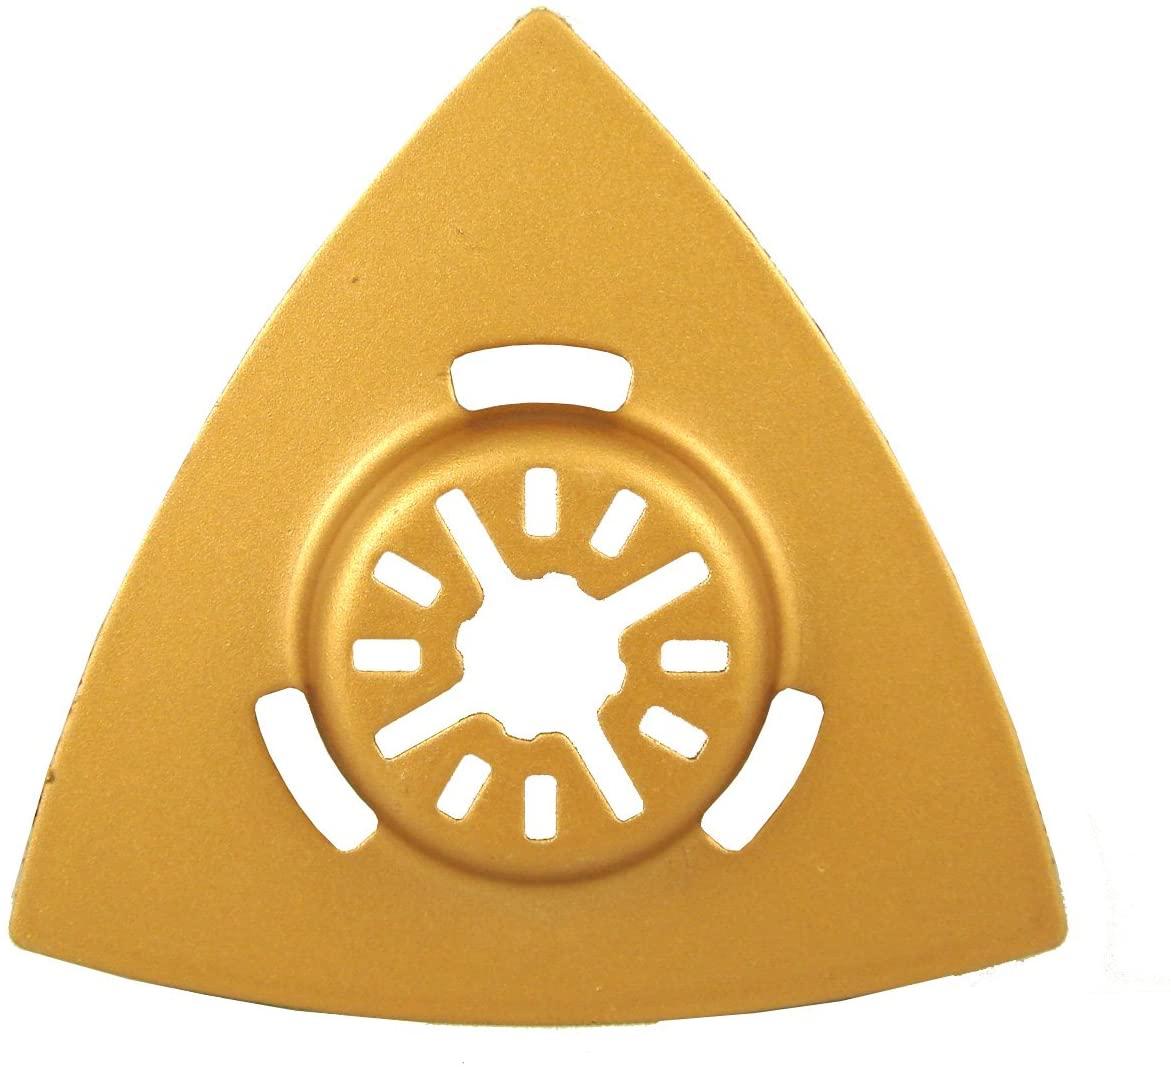 3 1/8 Triangular Carbide Rasp with Universal Arbor for Fein, Dremel, Bosch, Porter Cable, Ridgid, Ryobi, Milwaukee, Dewalt, Skil and More